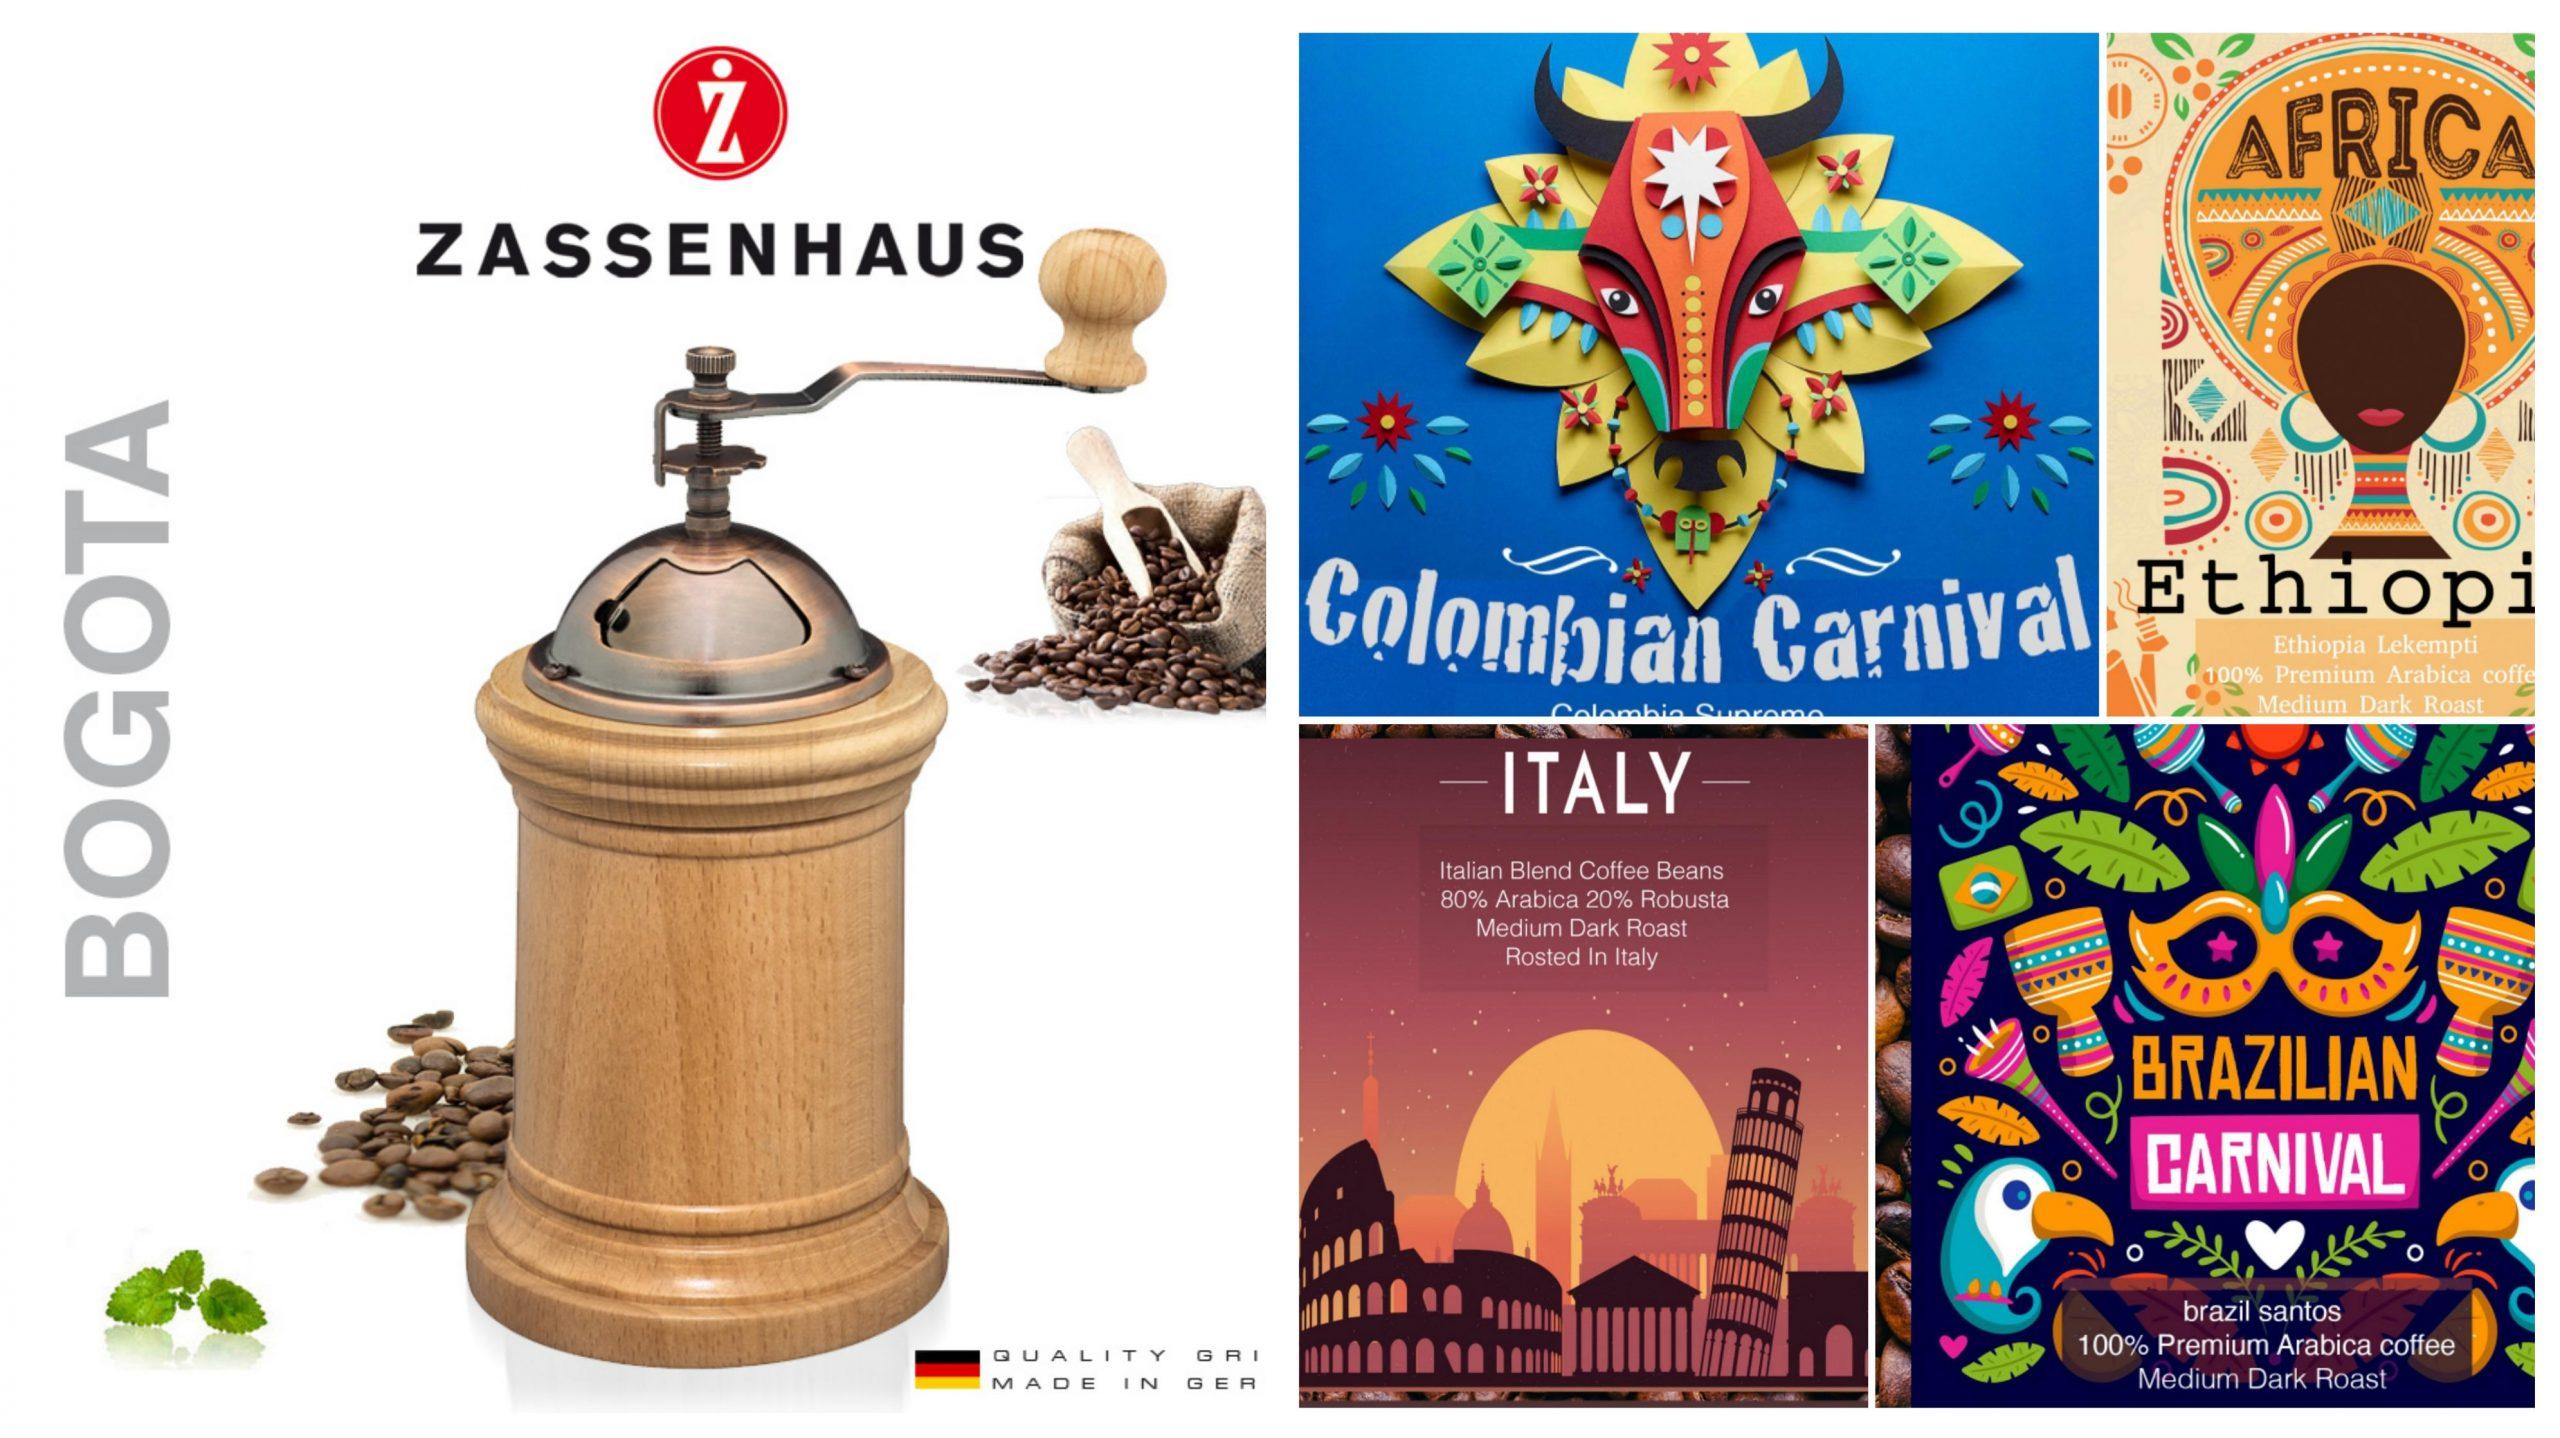 Zassenhaus Bogota Coffee grinder + Tostato Coffee 500kg